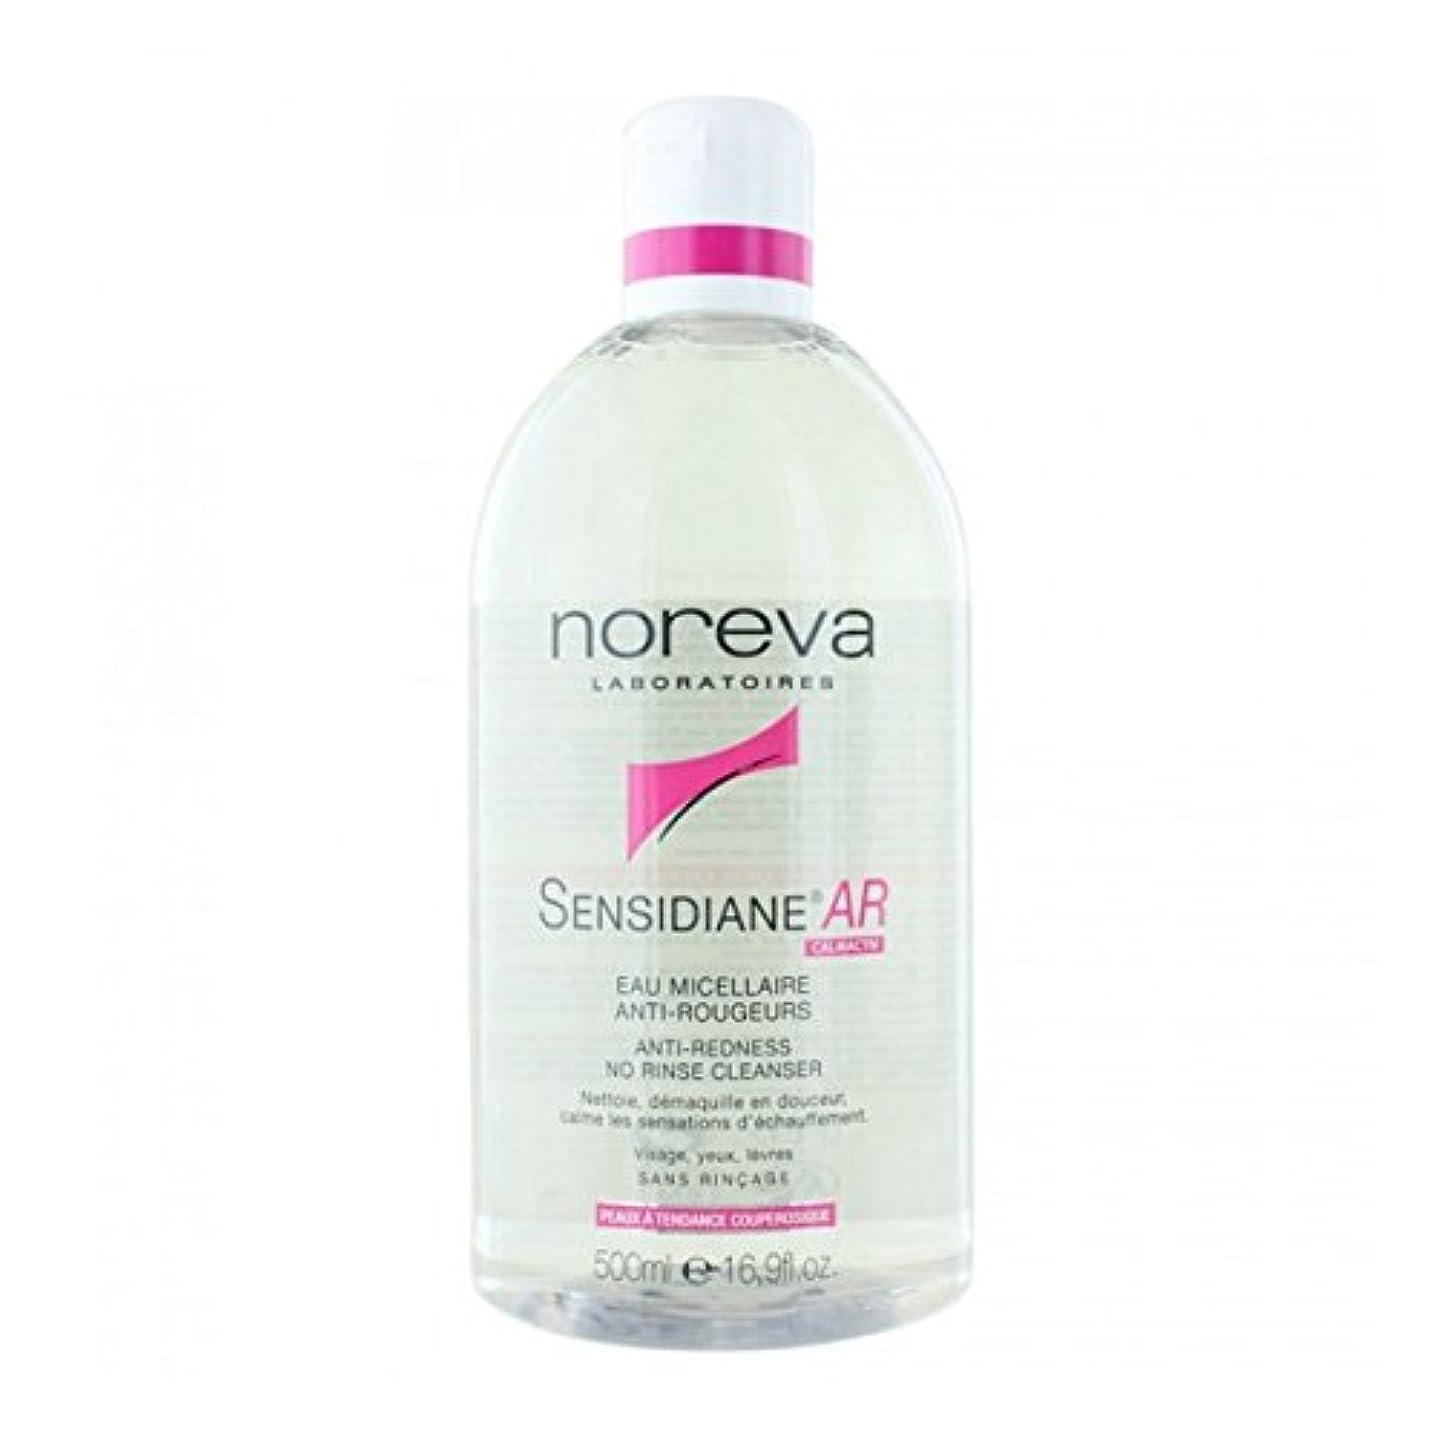 雑品誓う名誉Noreva Sensidiane Ar Anti-redness No Rinse Cleanser 500ml [並行輸入品]